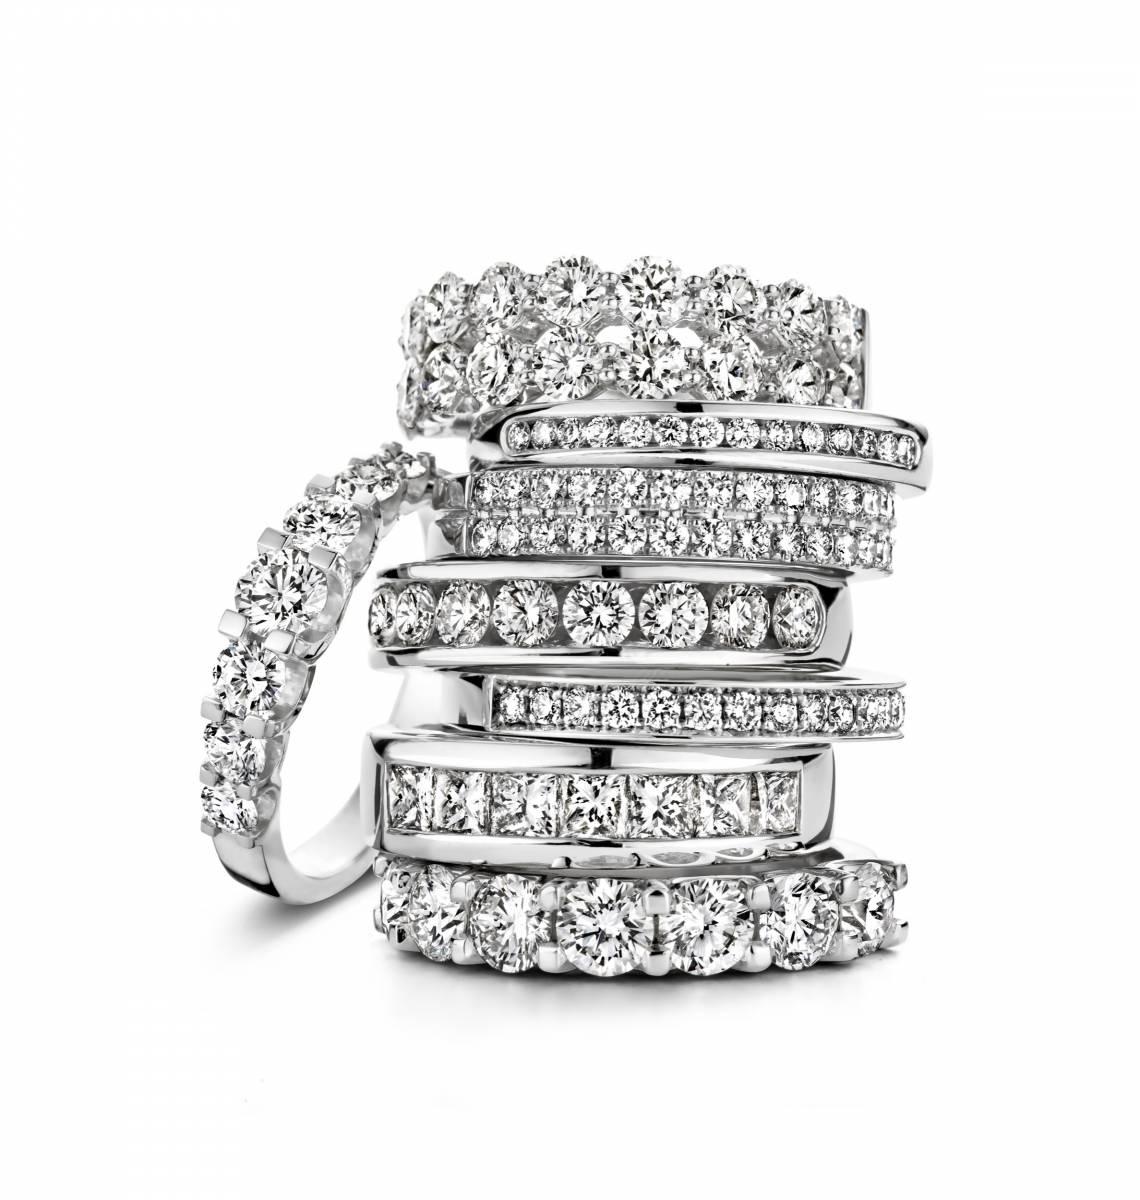 Juwelier Martens - House of Weddings 13